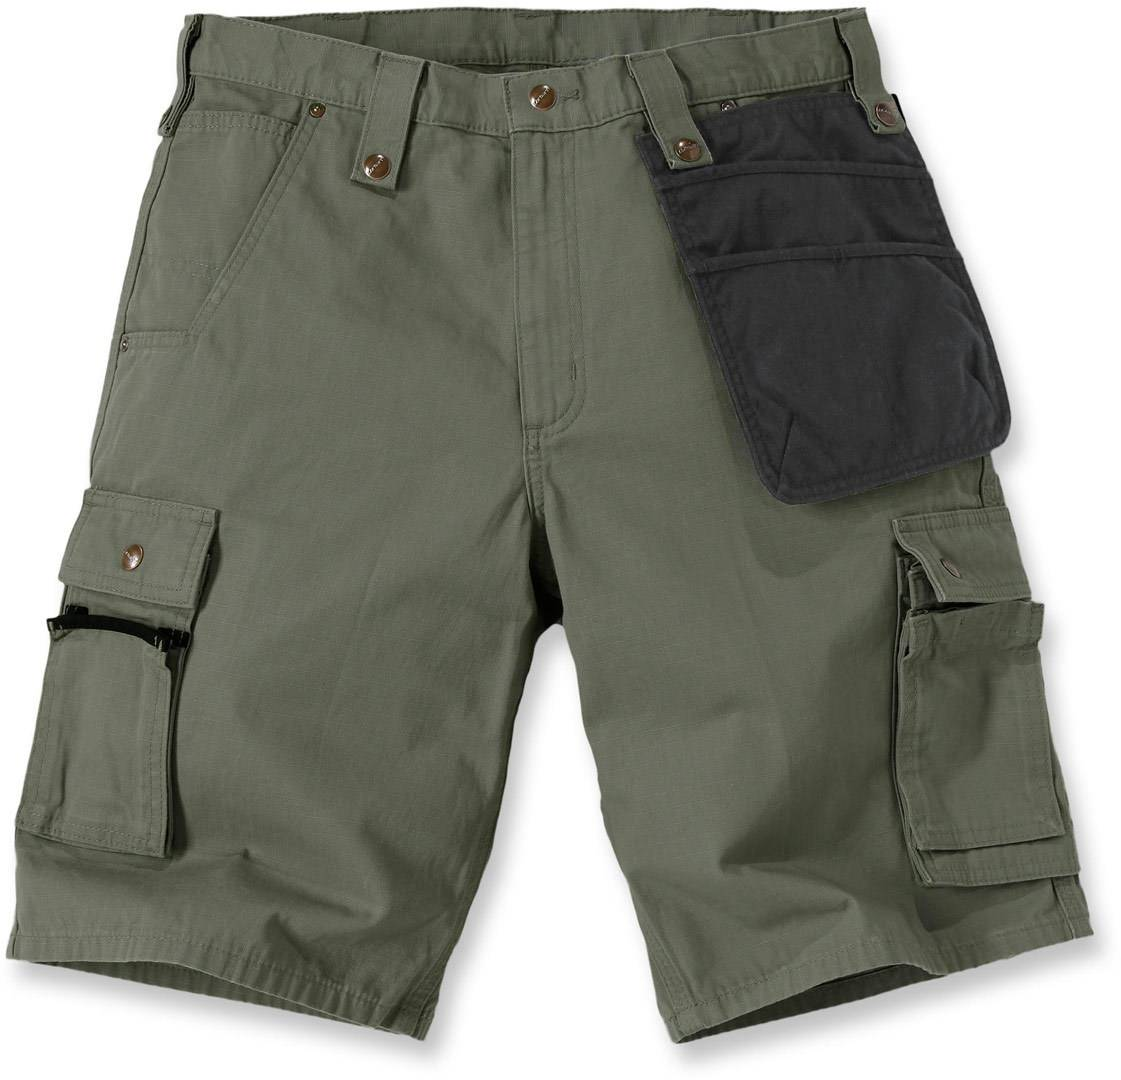 Carhartt Multi Pocket Ripstop Pantalones cortos Verde 32